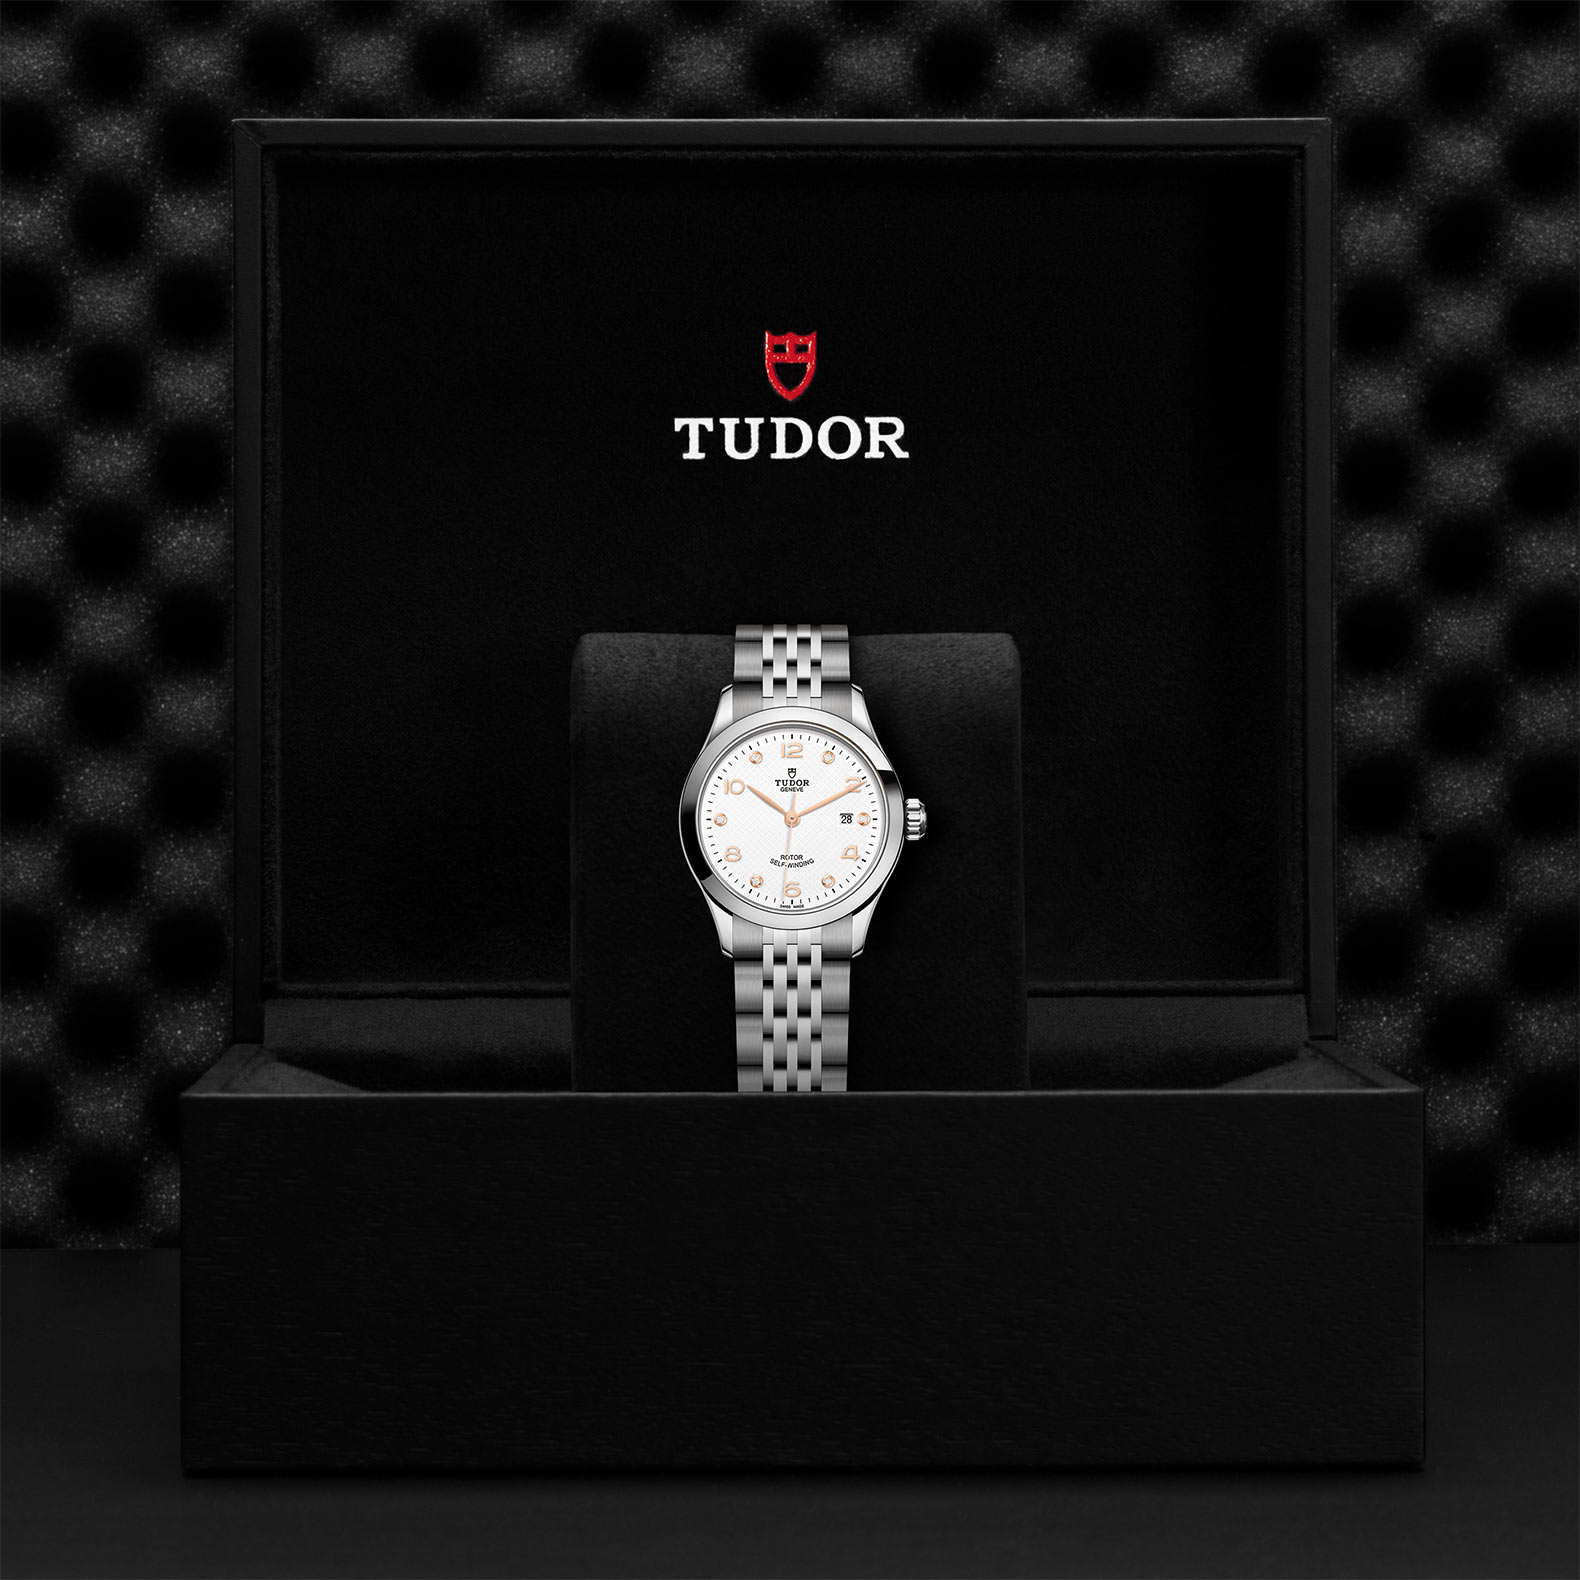 TUDOR 1926 - M91350-0013